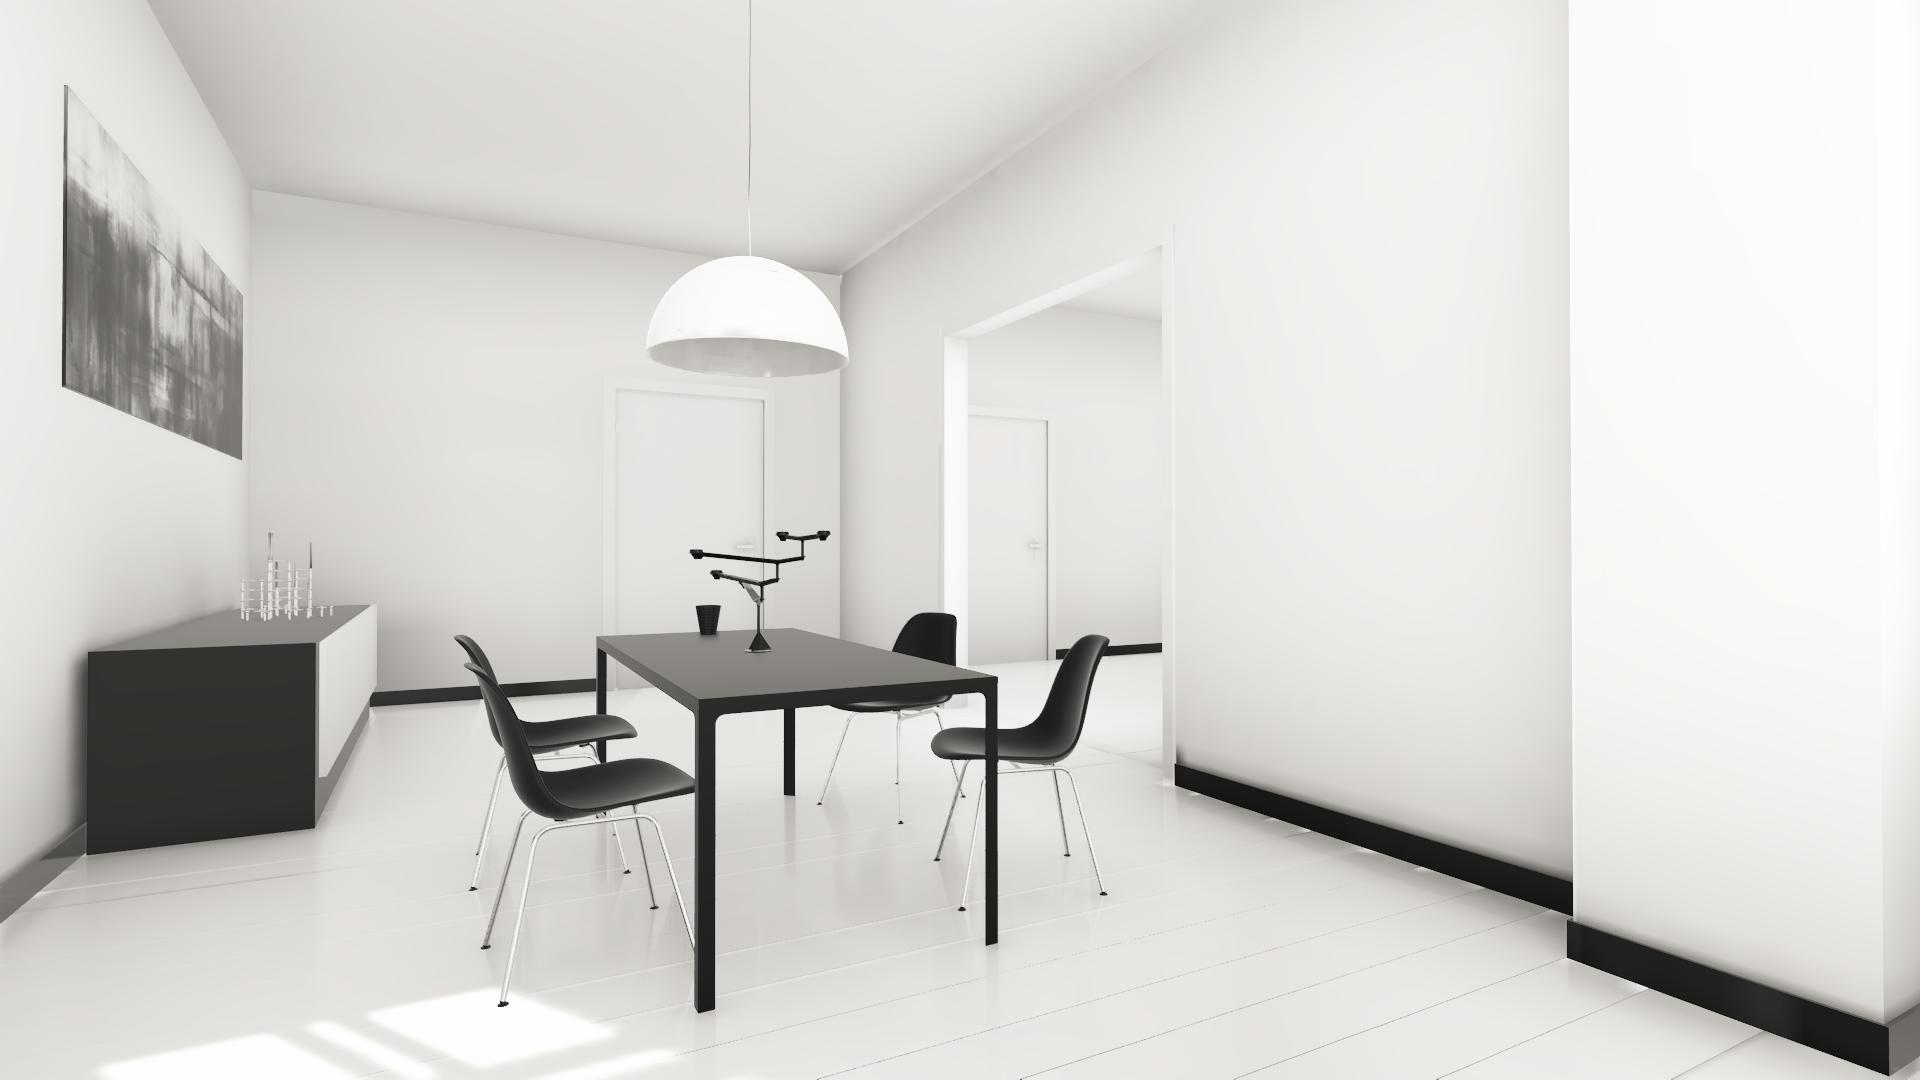 Realtime Rendering - White Bedroom